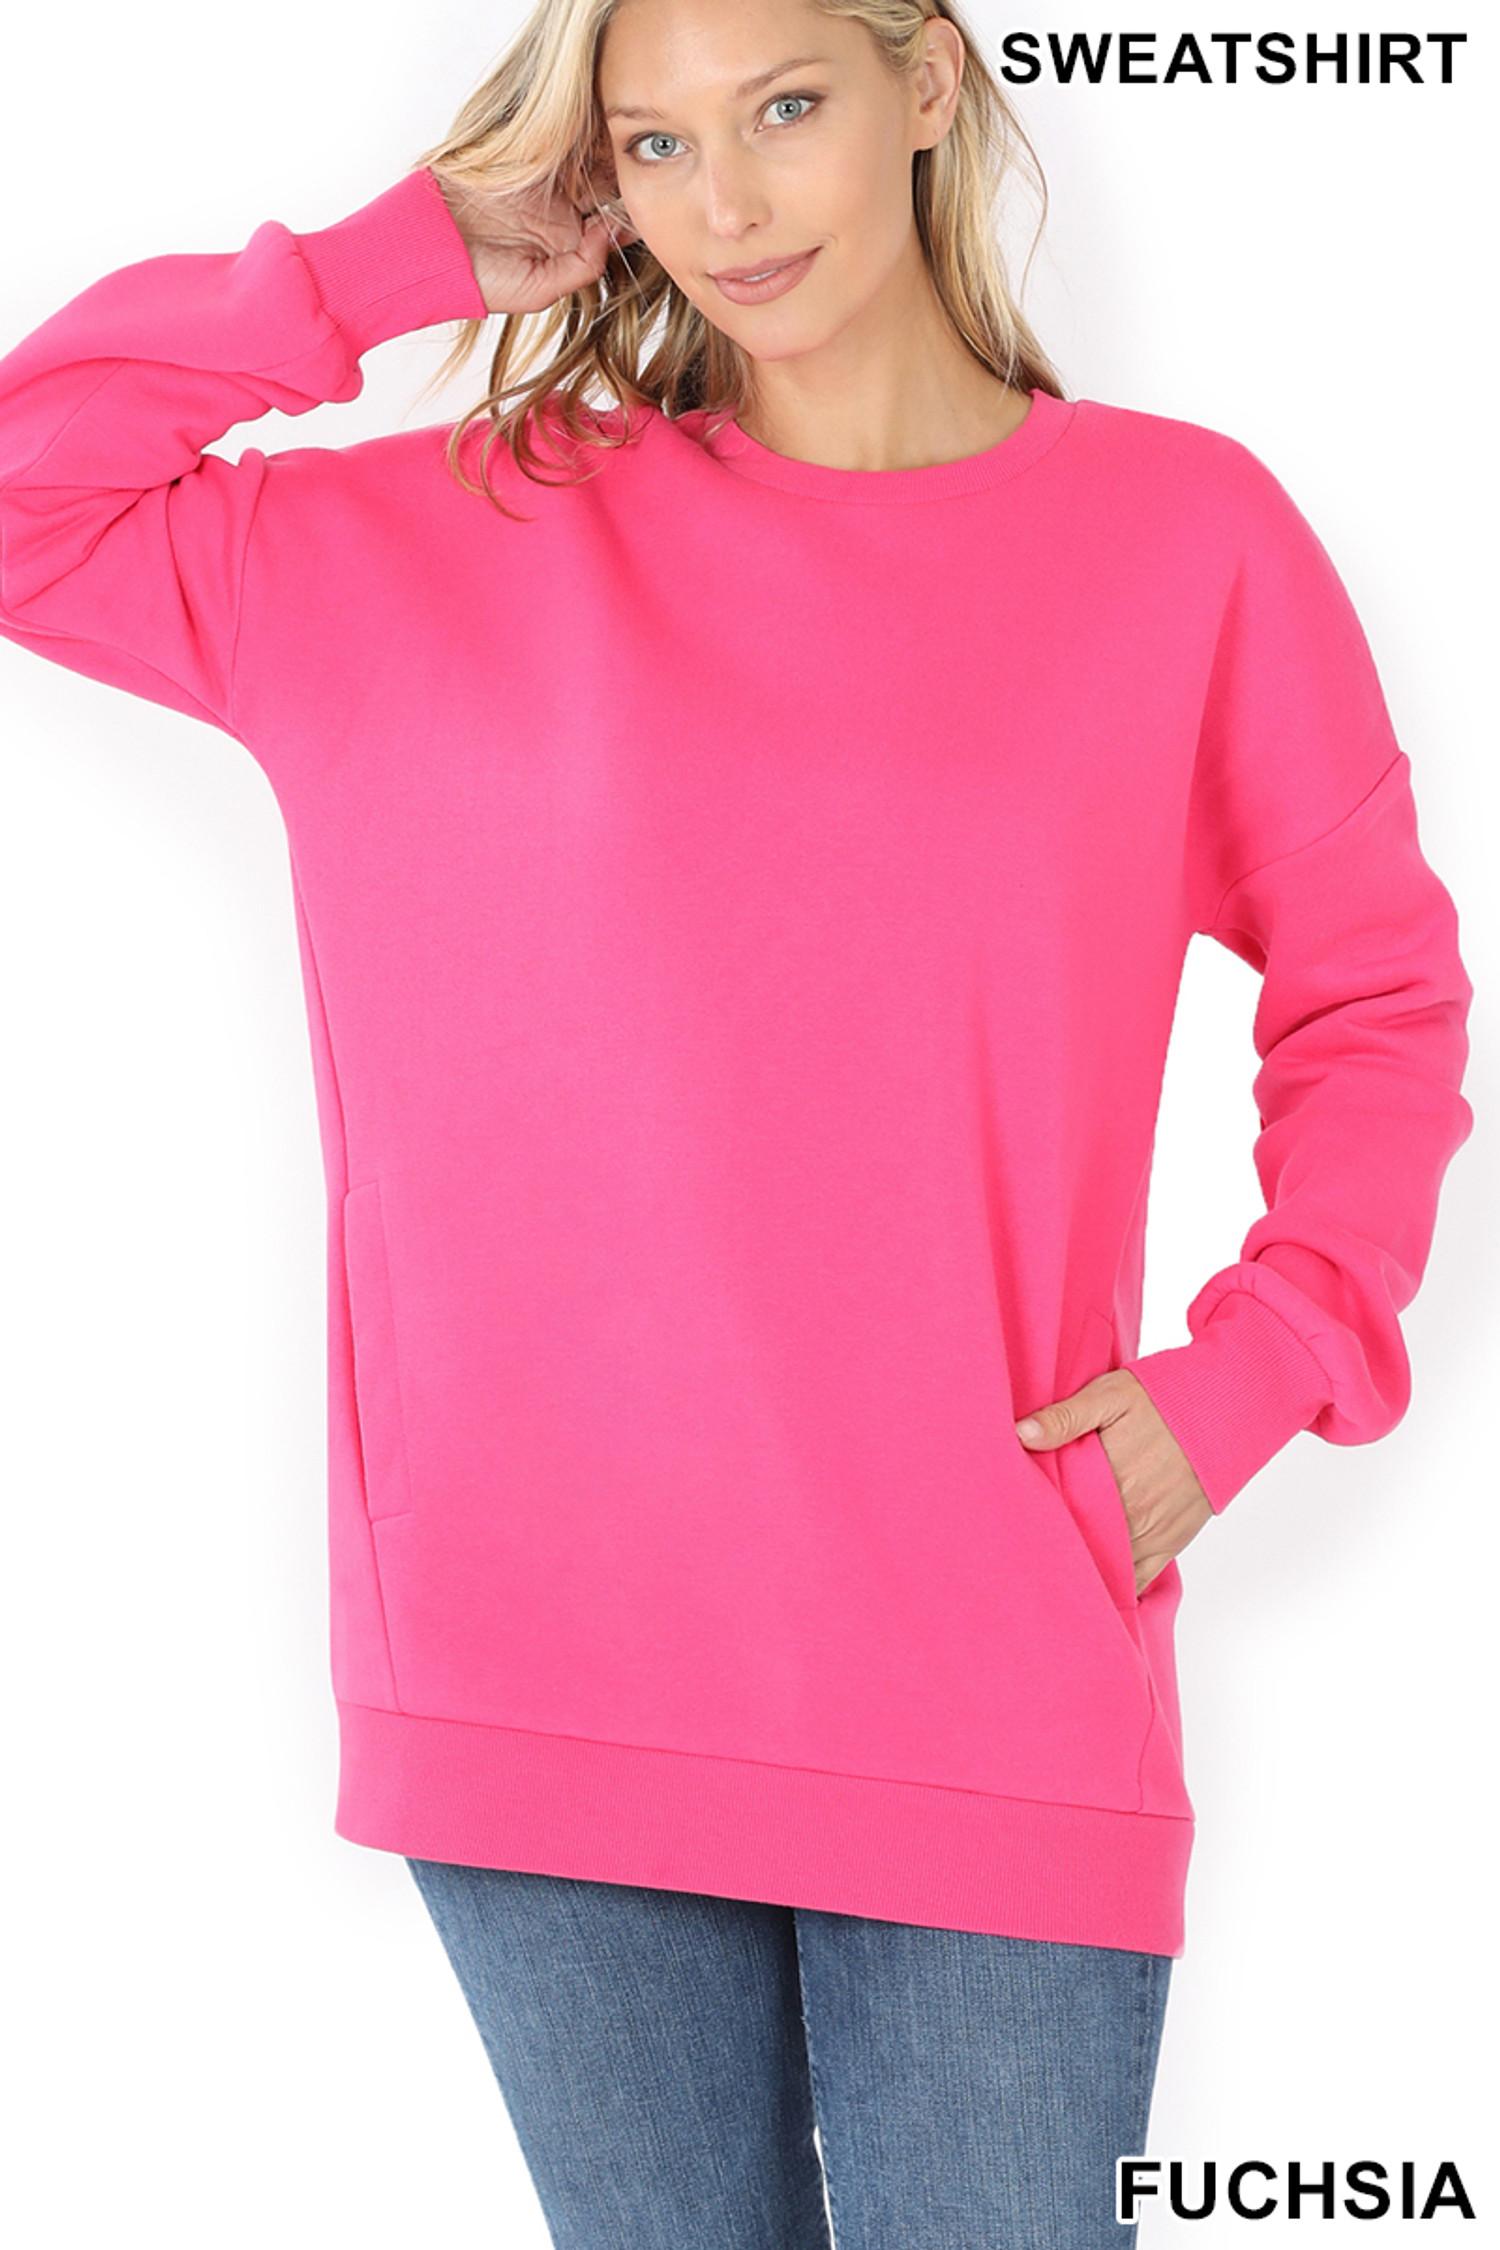 Front image of Fuchsia Round Crew Neck Sweatshirt with Side Pockets